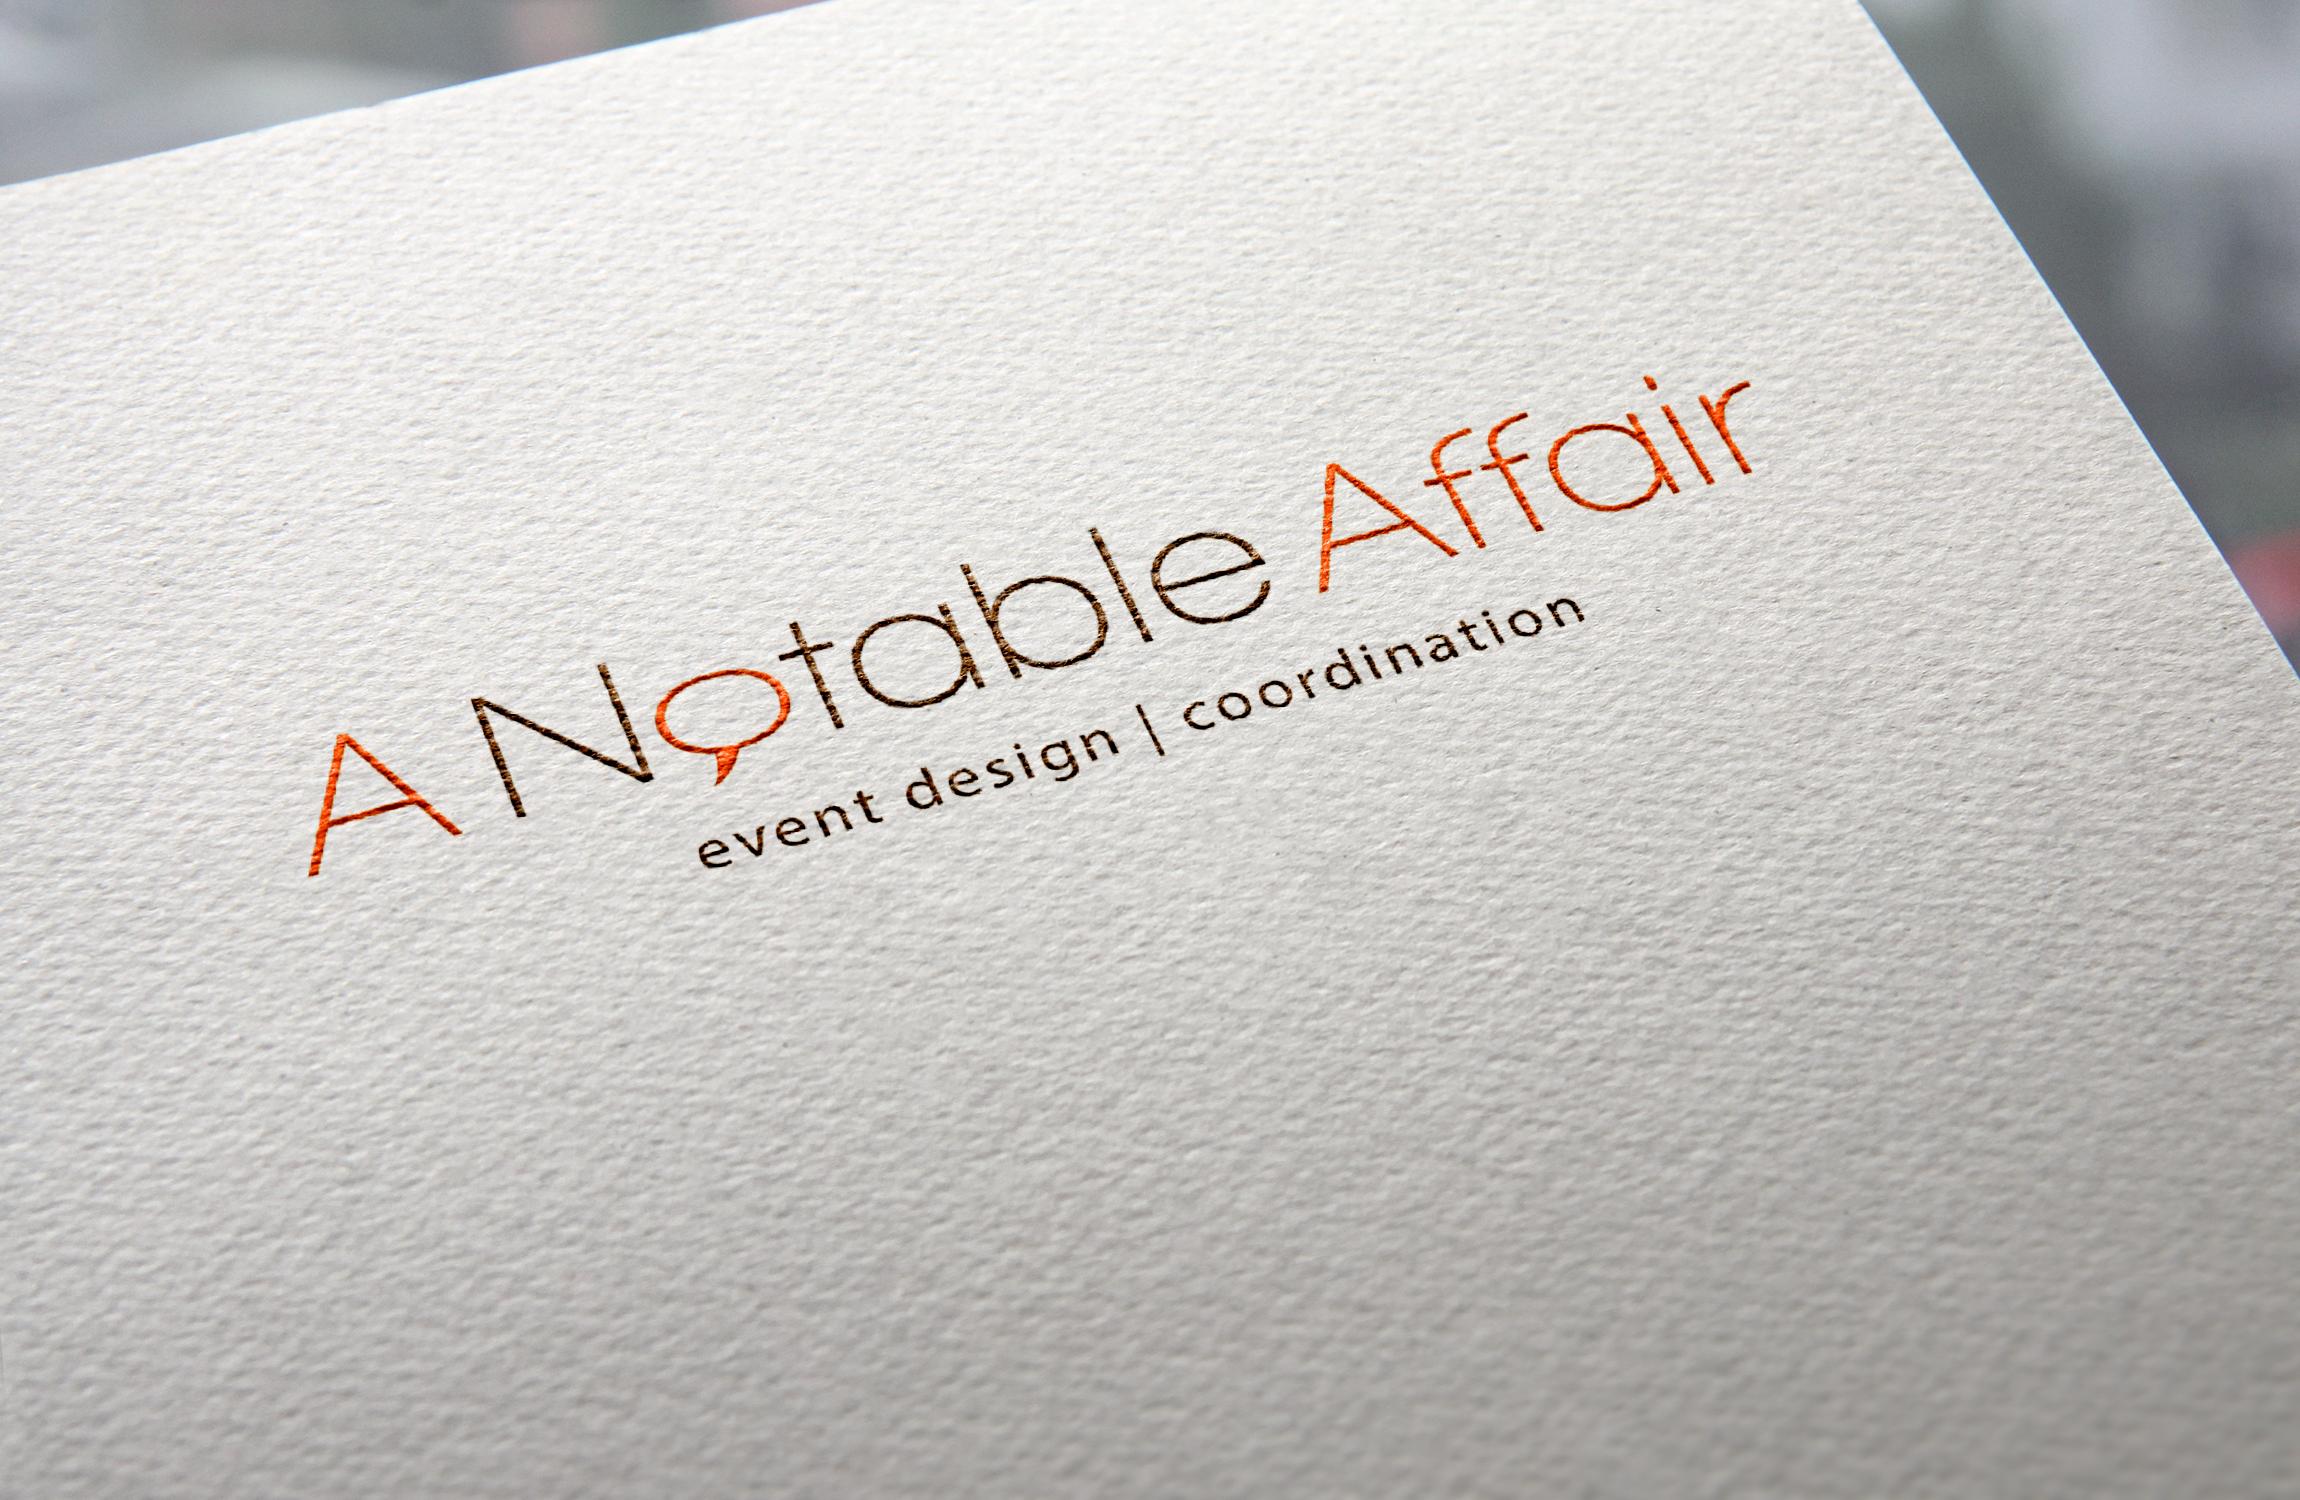 NotableAffair3